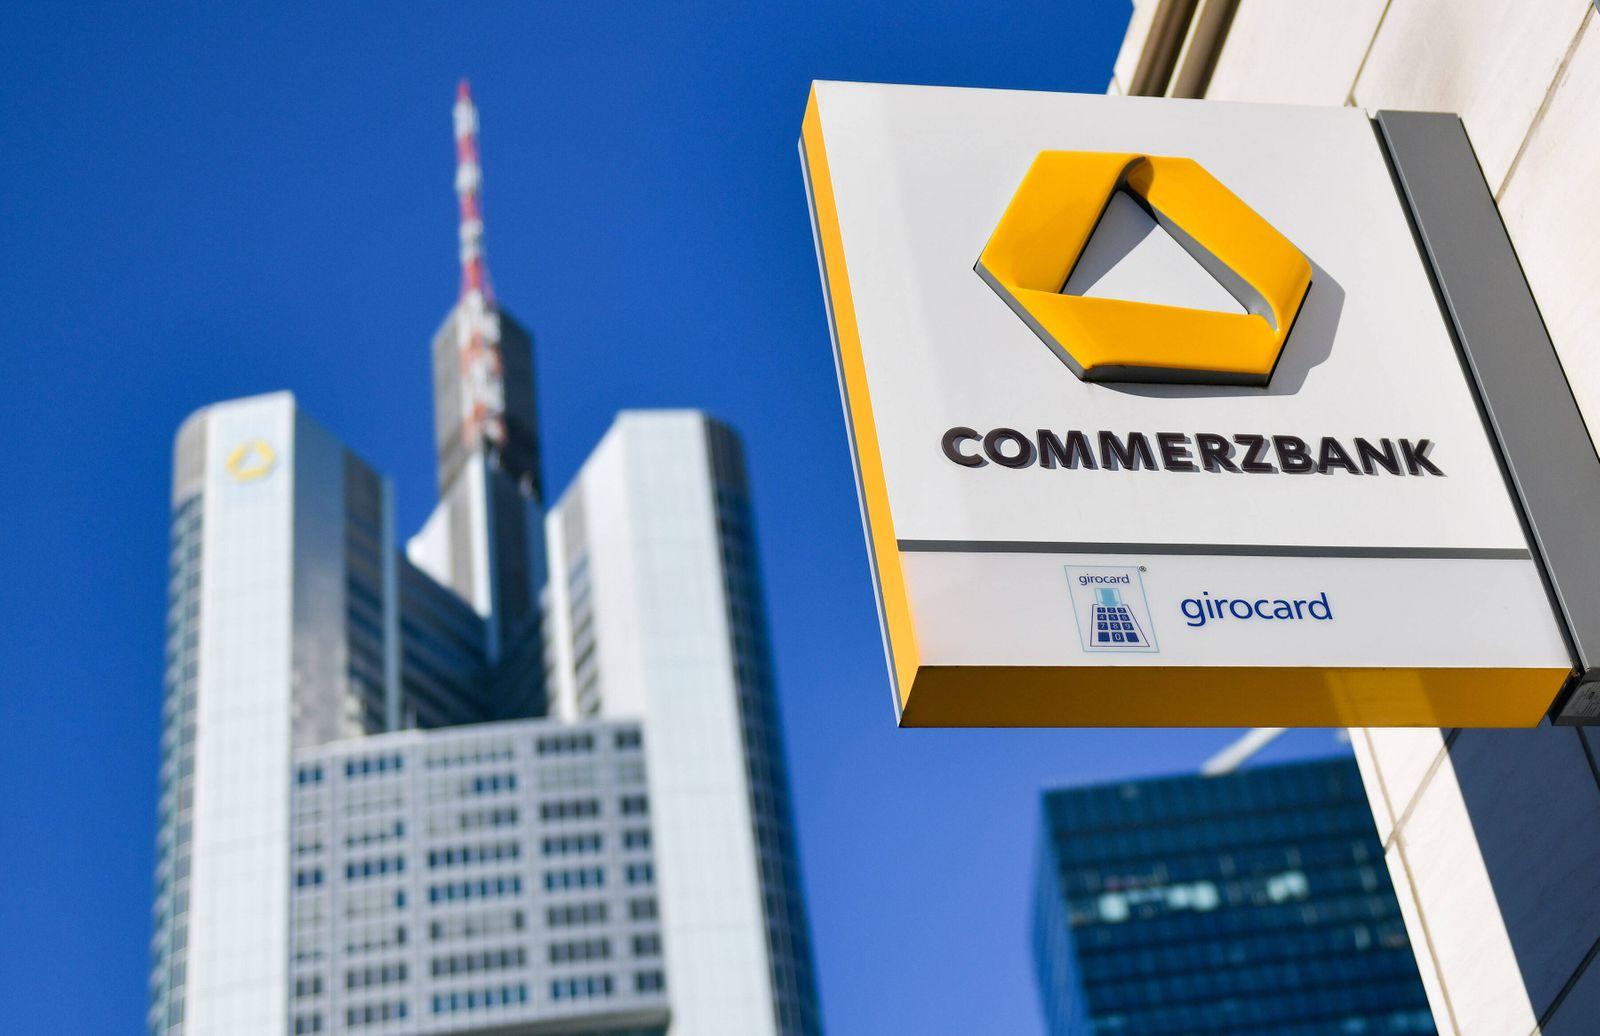 xblx, Commerzbank Filiale, dahinter der Commerzbank Tower Frankfurt am Main *** xblx, Commerzbank branch, behind it the